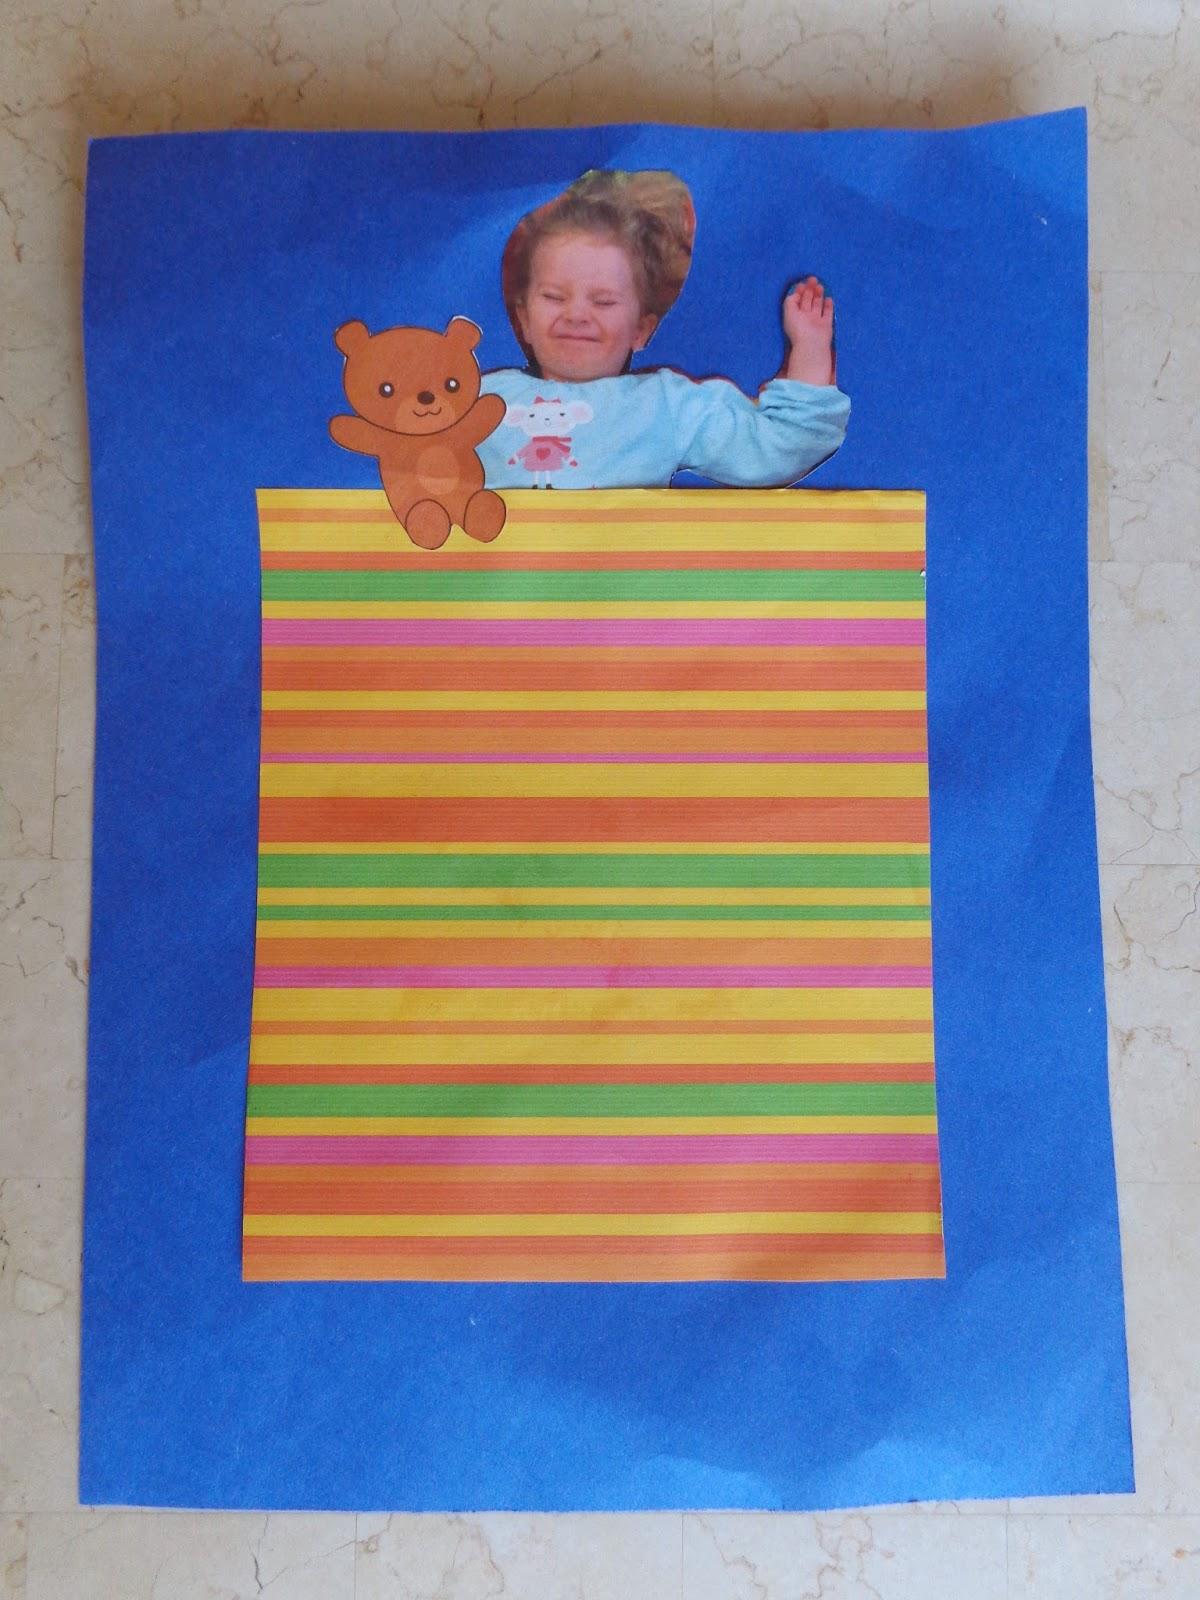 Terrific Preschool Years Pajama Day